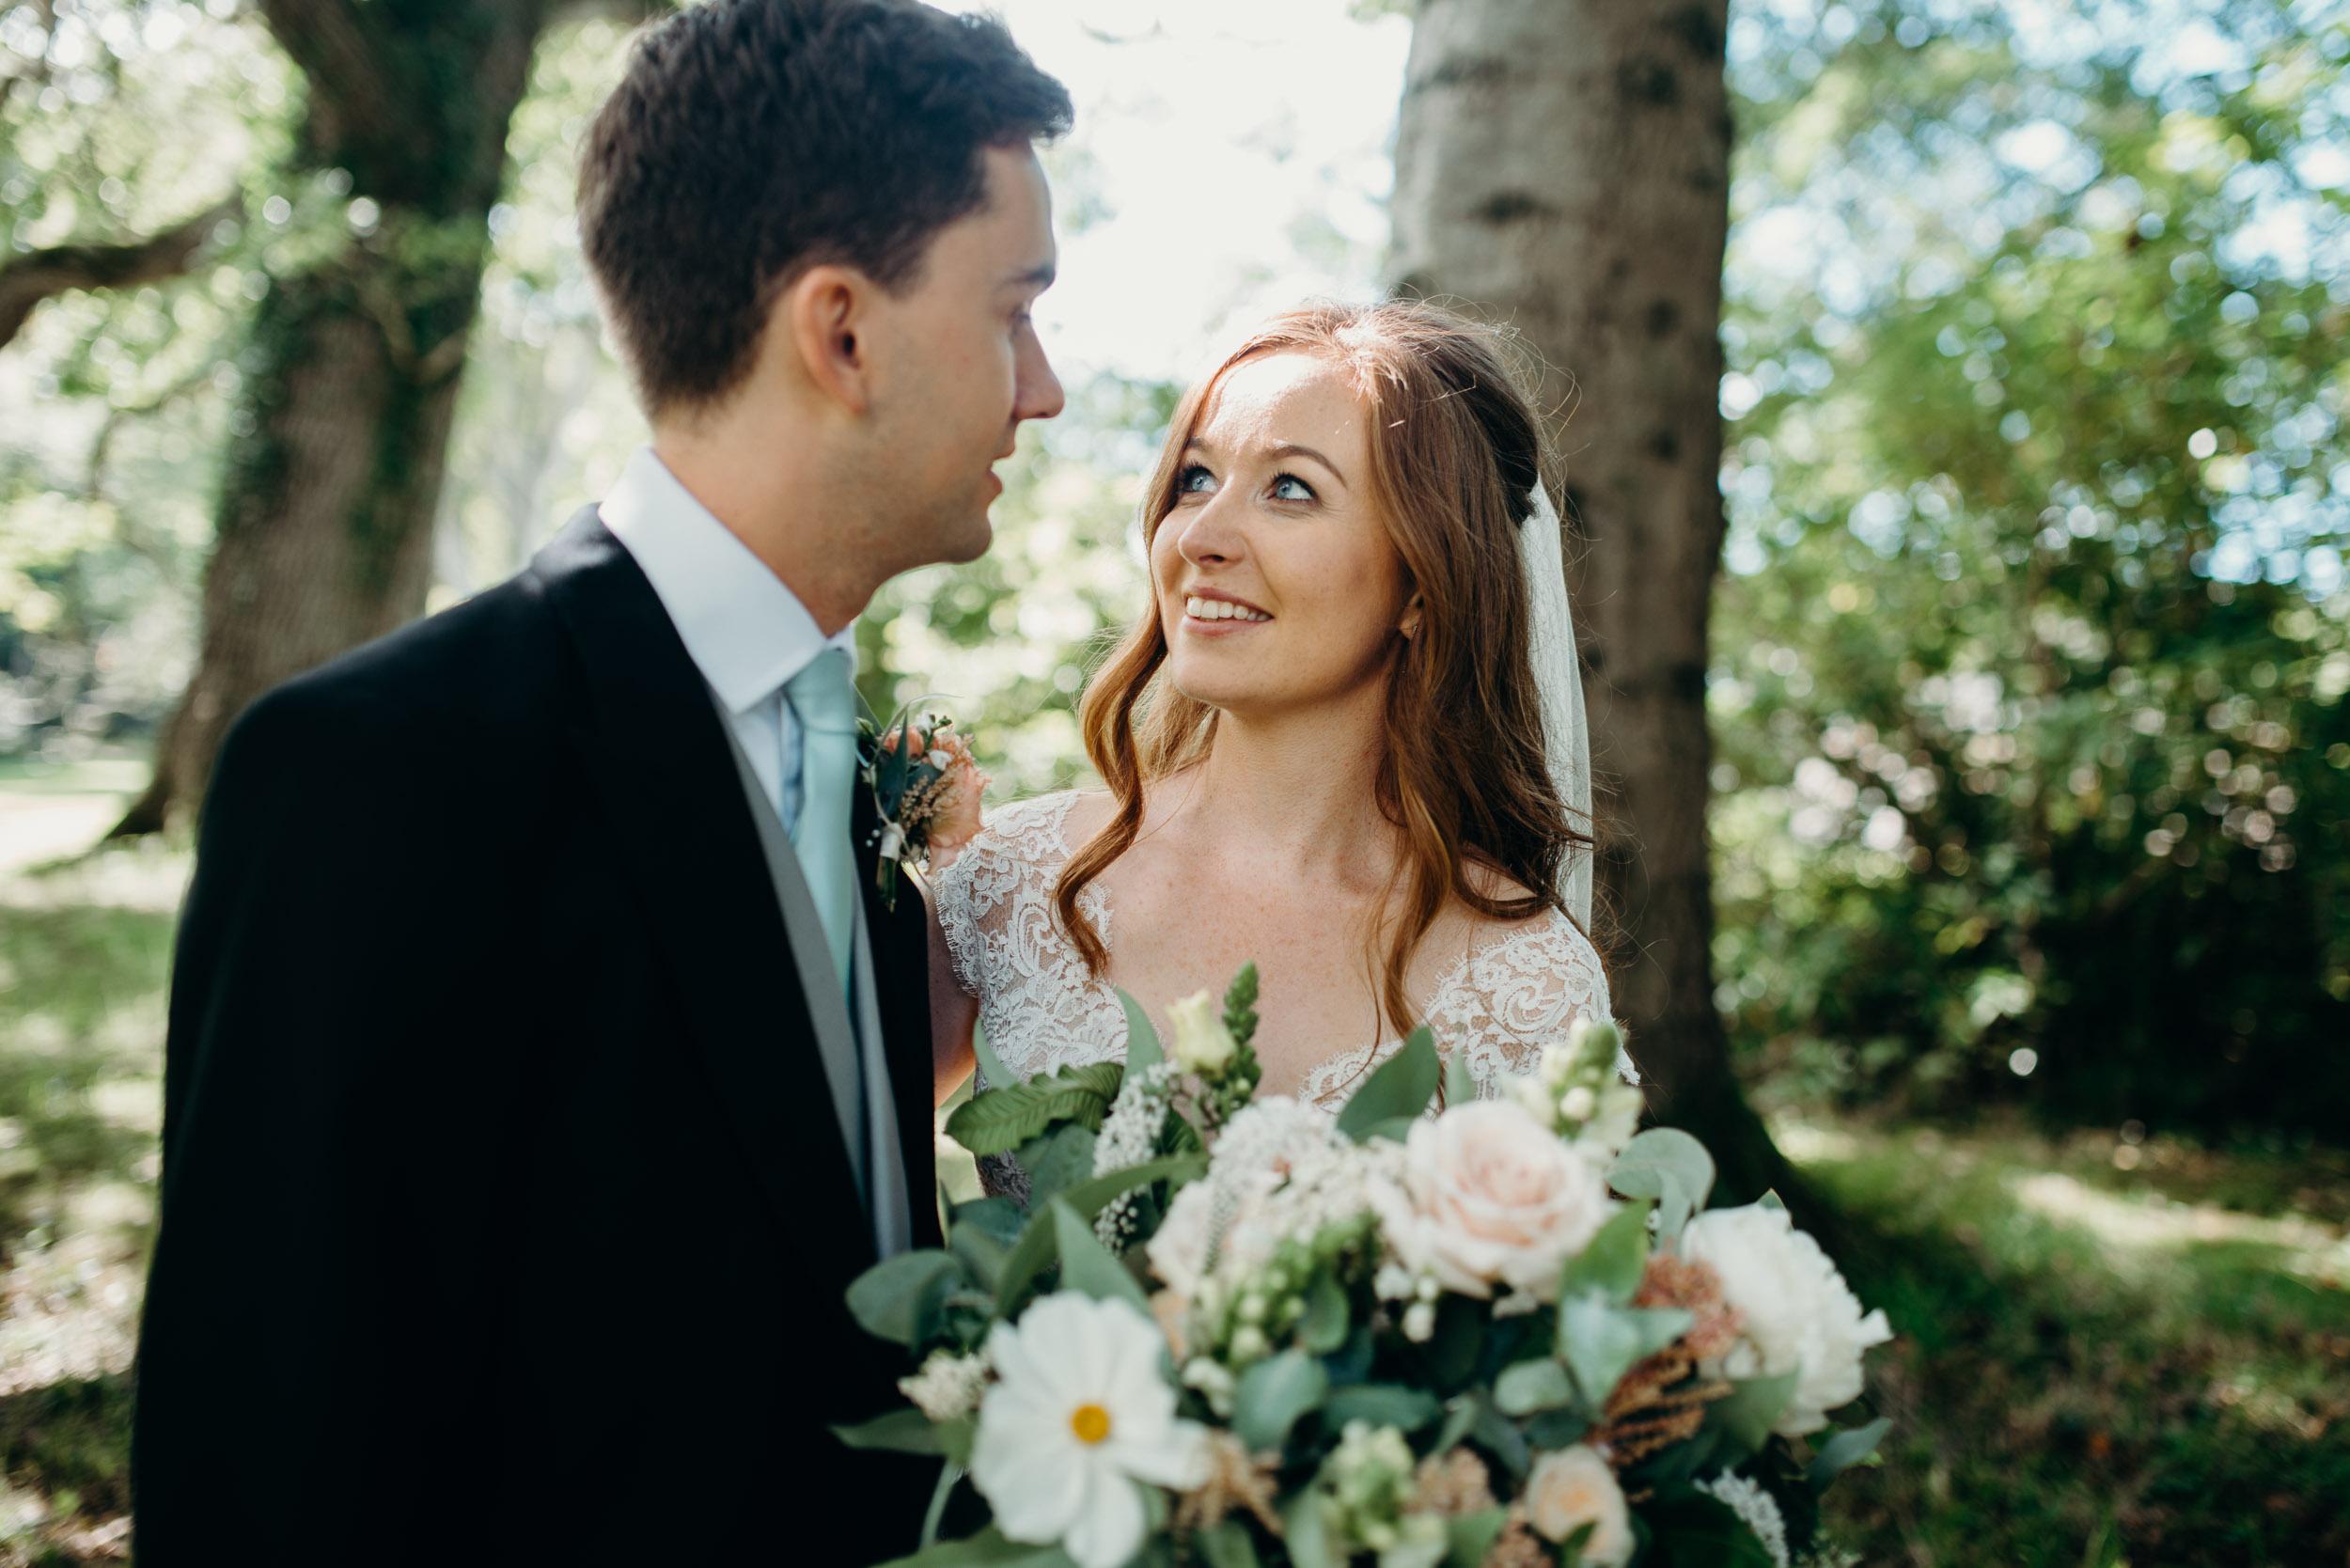 drenagh estate wedding photography-84.jpg